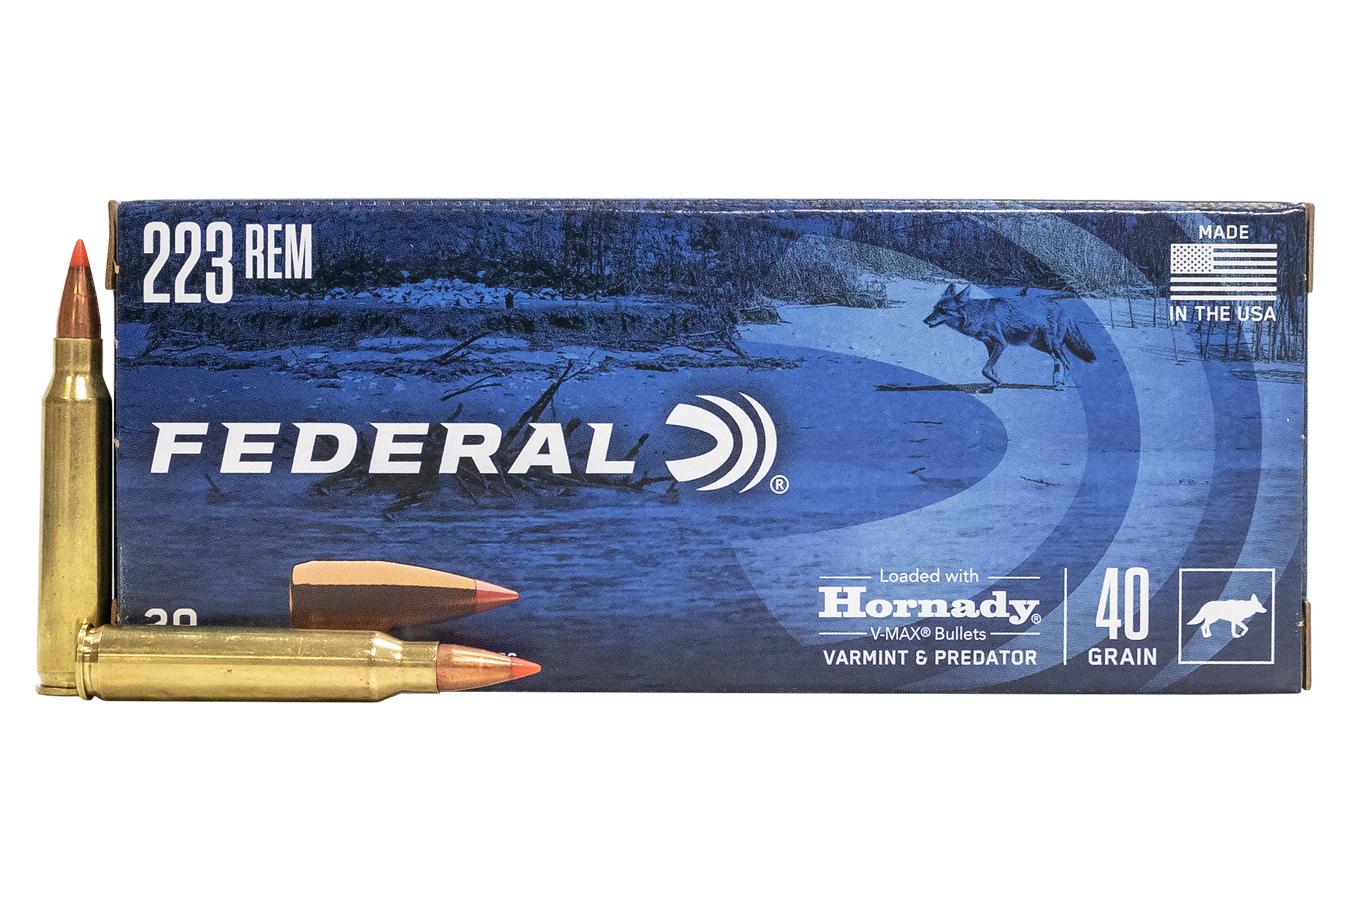 Federal 223 REM 40 gr Hornady V-Max Varmint and Predator 20/Box